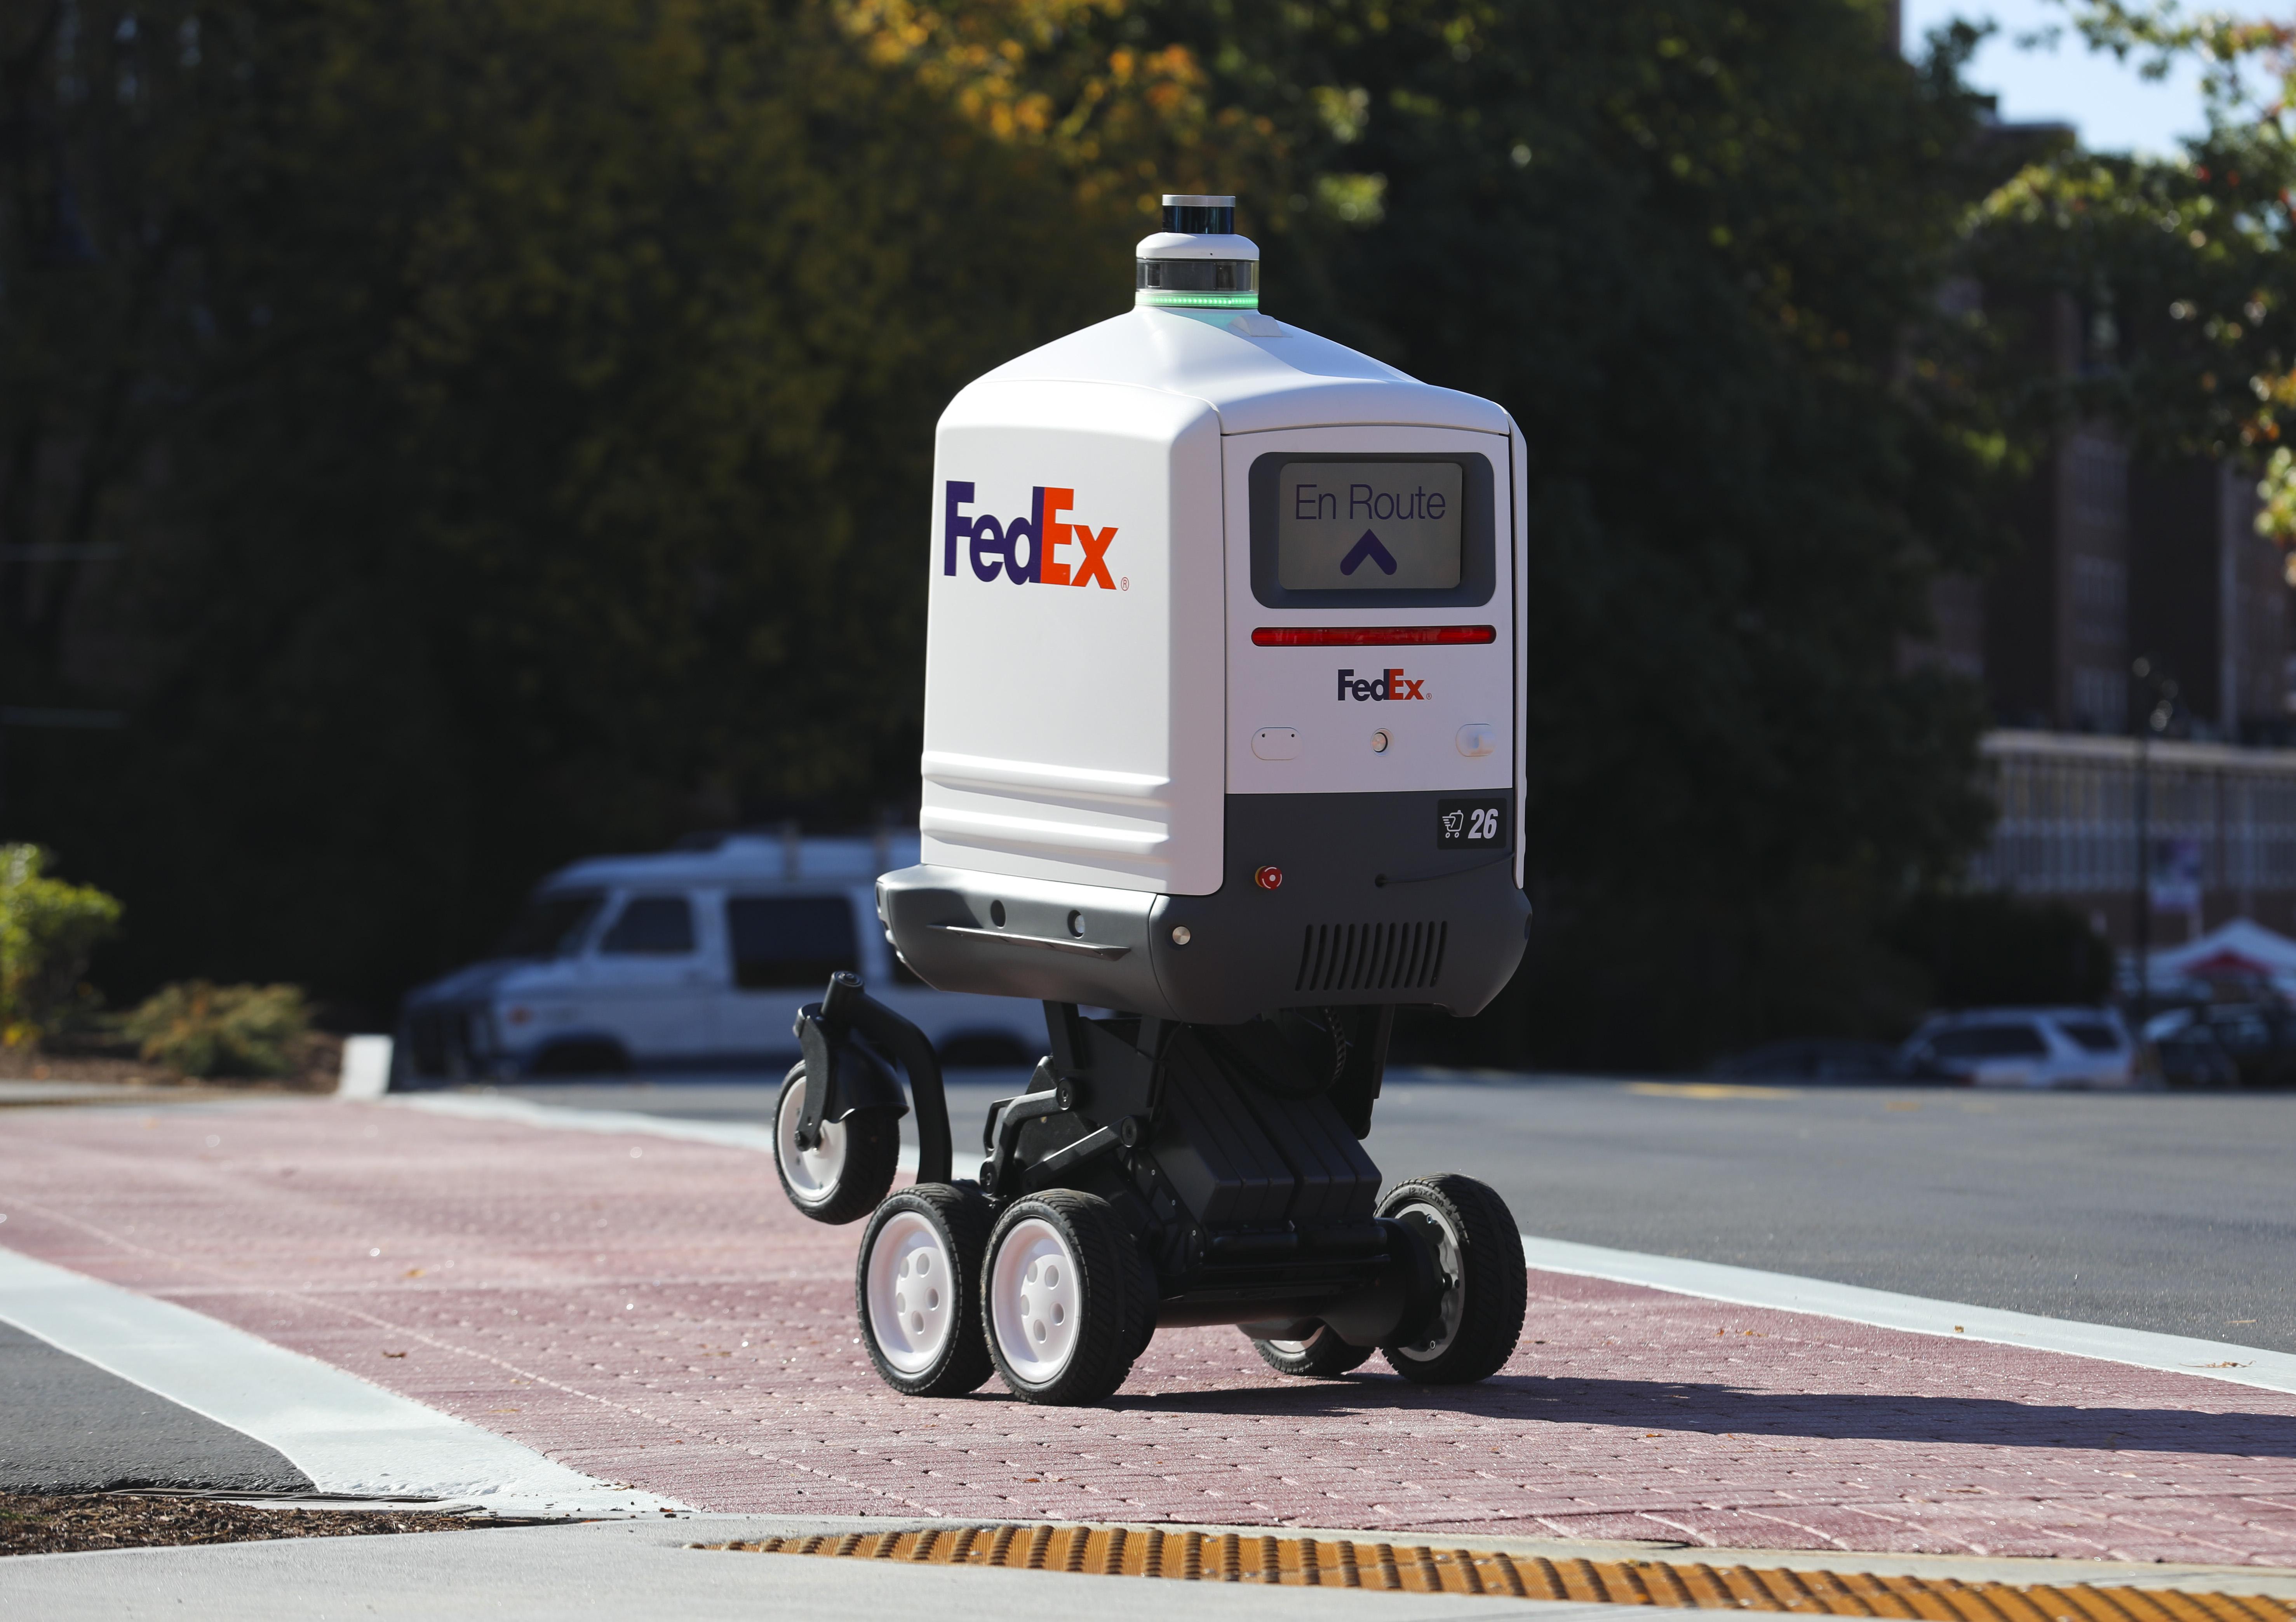 Fedex roxo 3rd gen 3